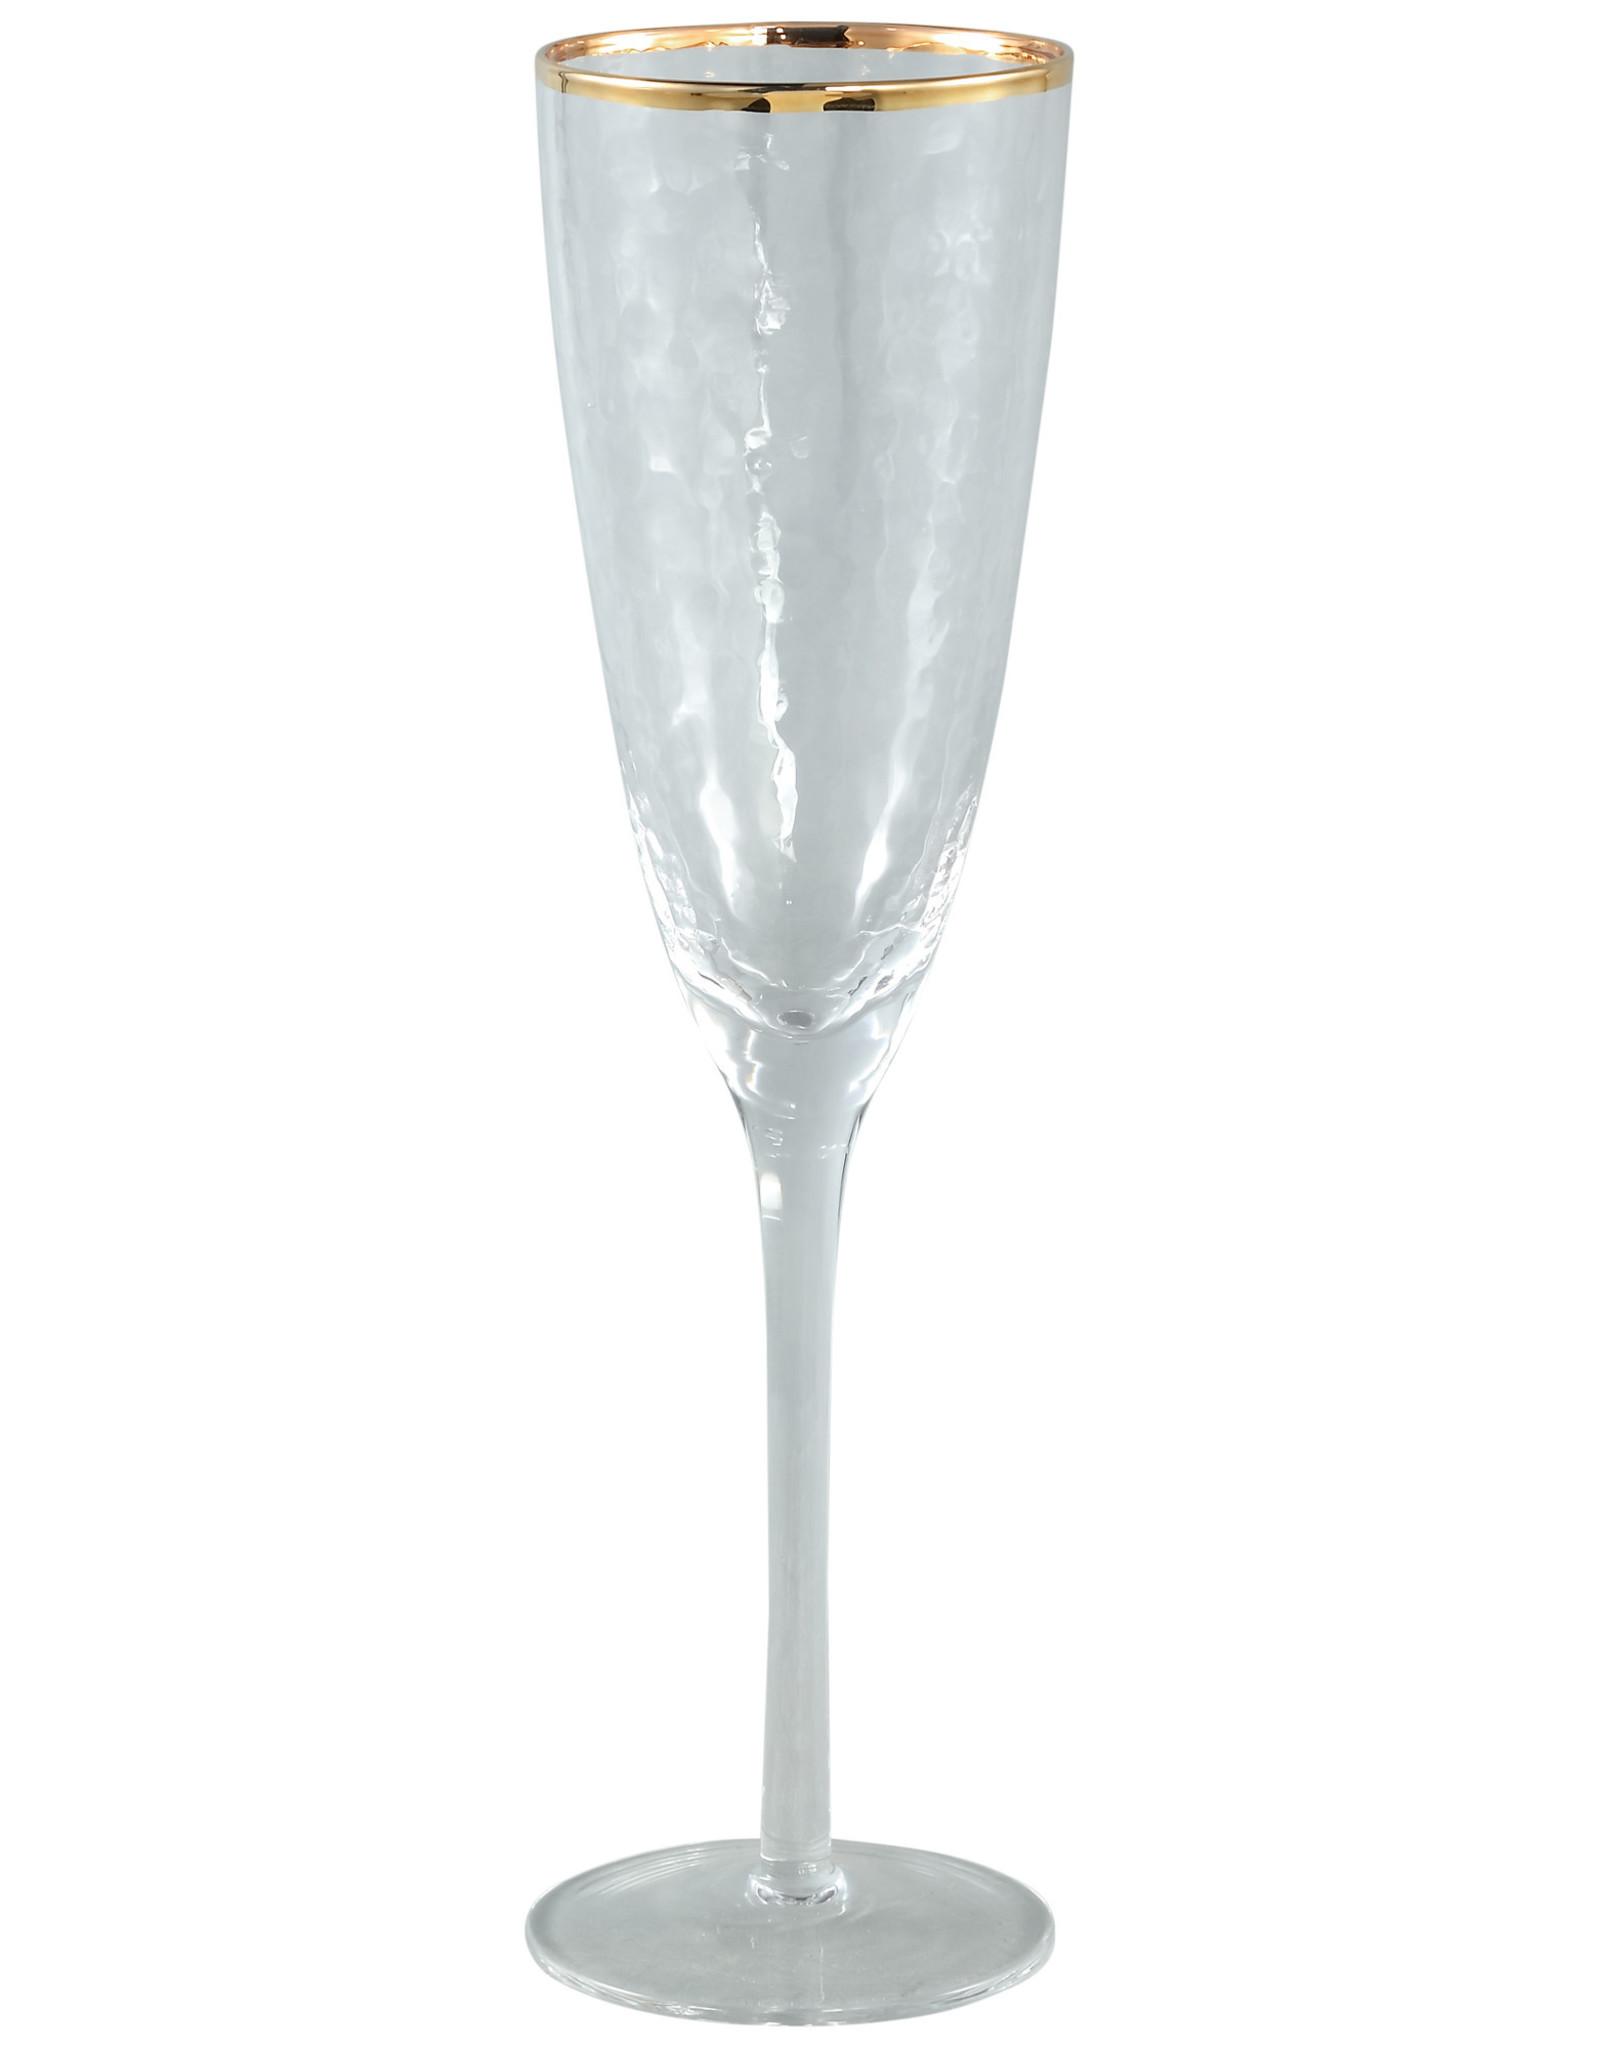 Champagneglas met gouden rand